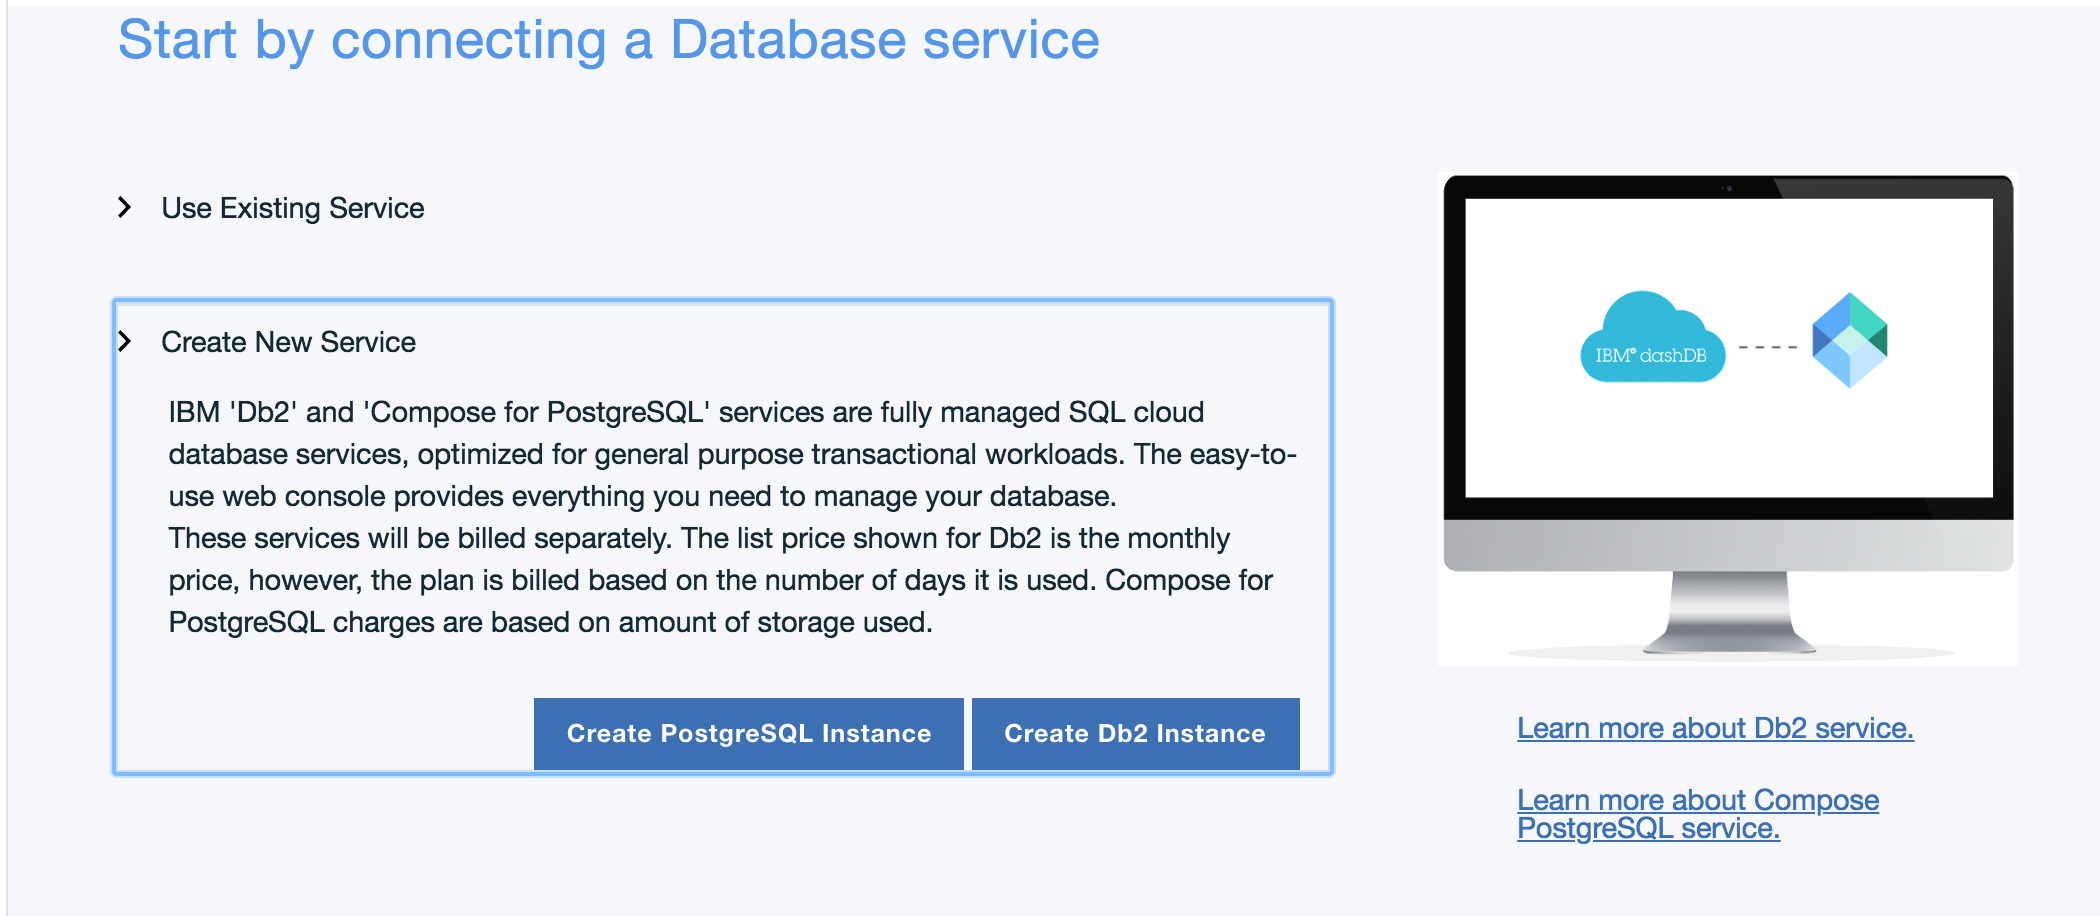 Using Mobile Foundation service on IBM Cloud - IBM Mobile Foundation